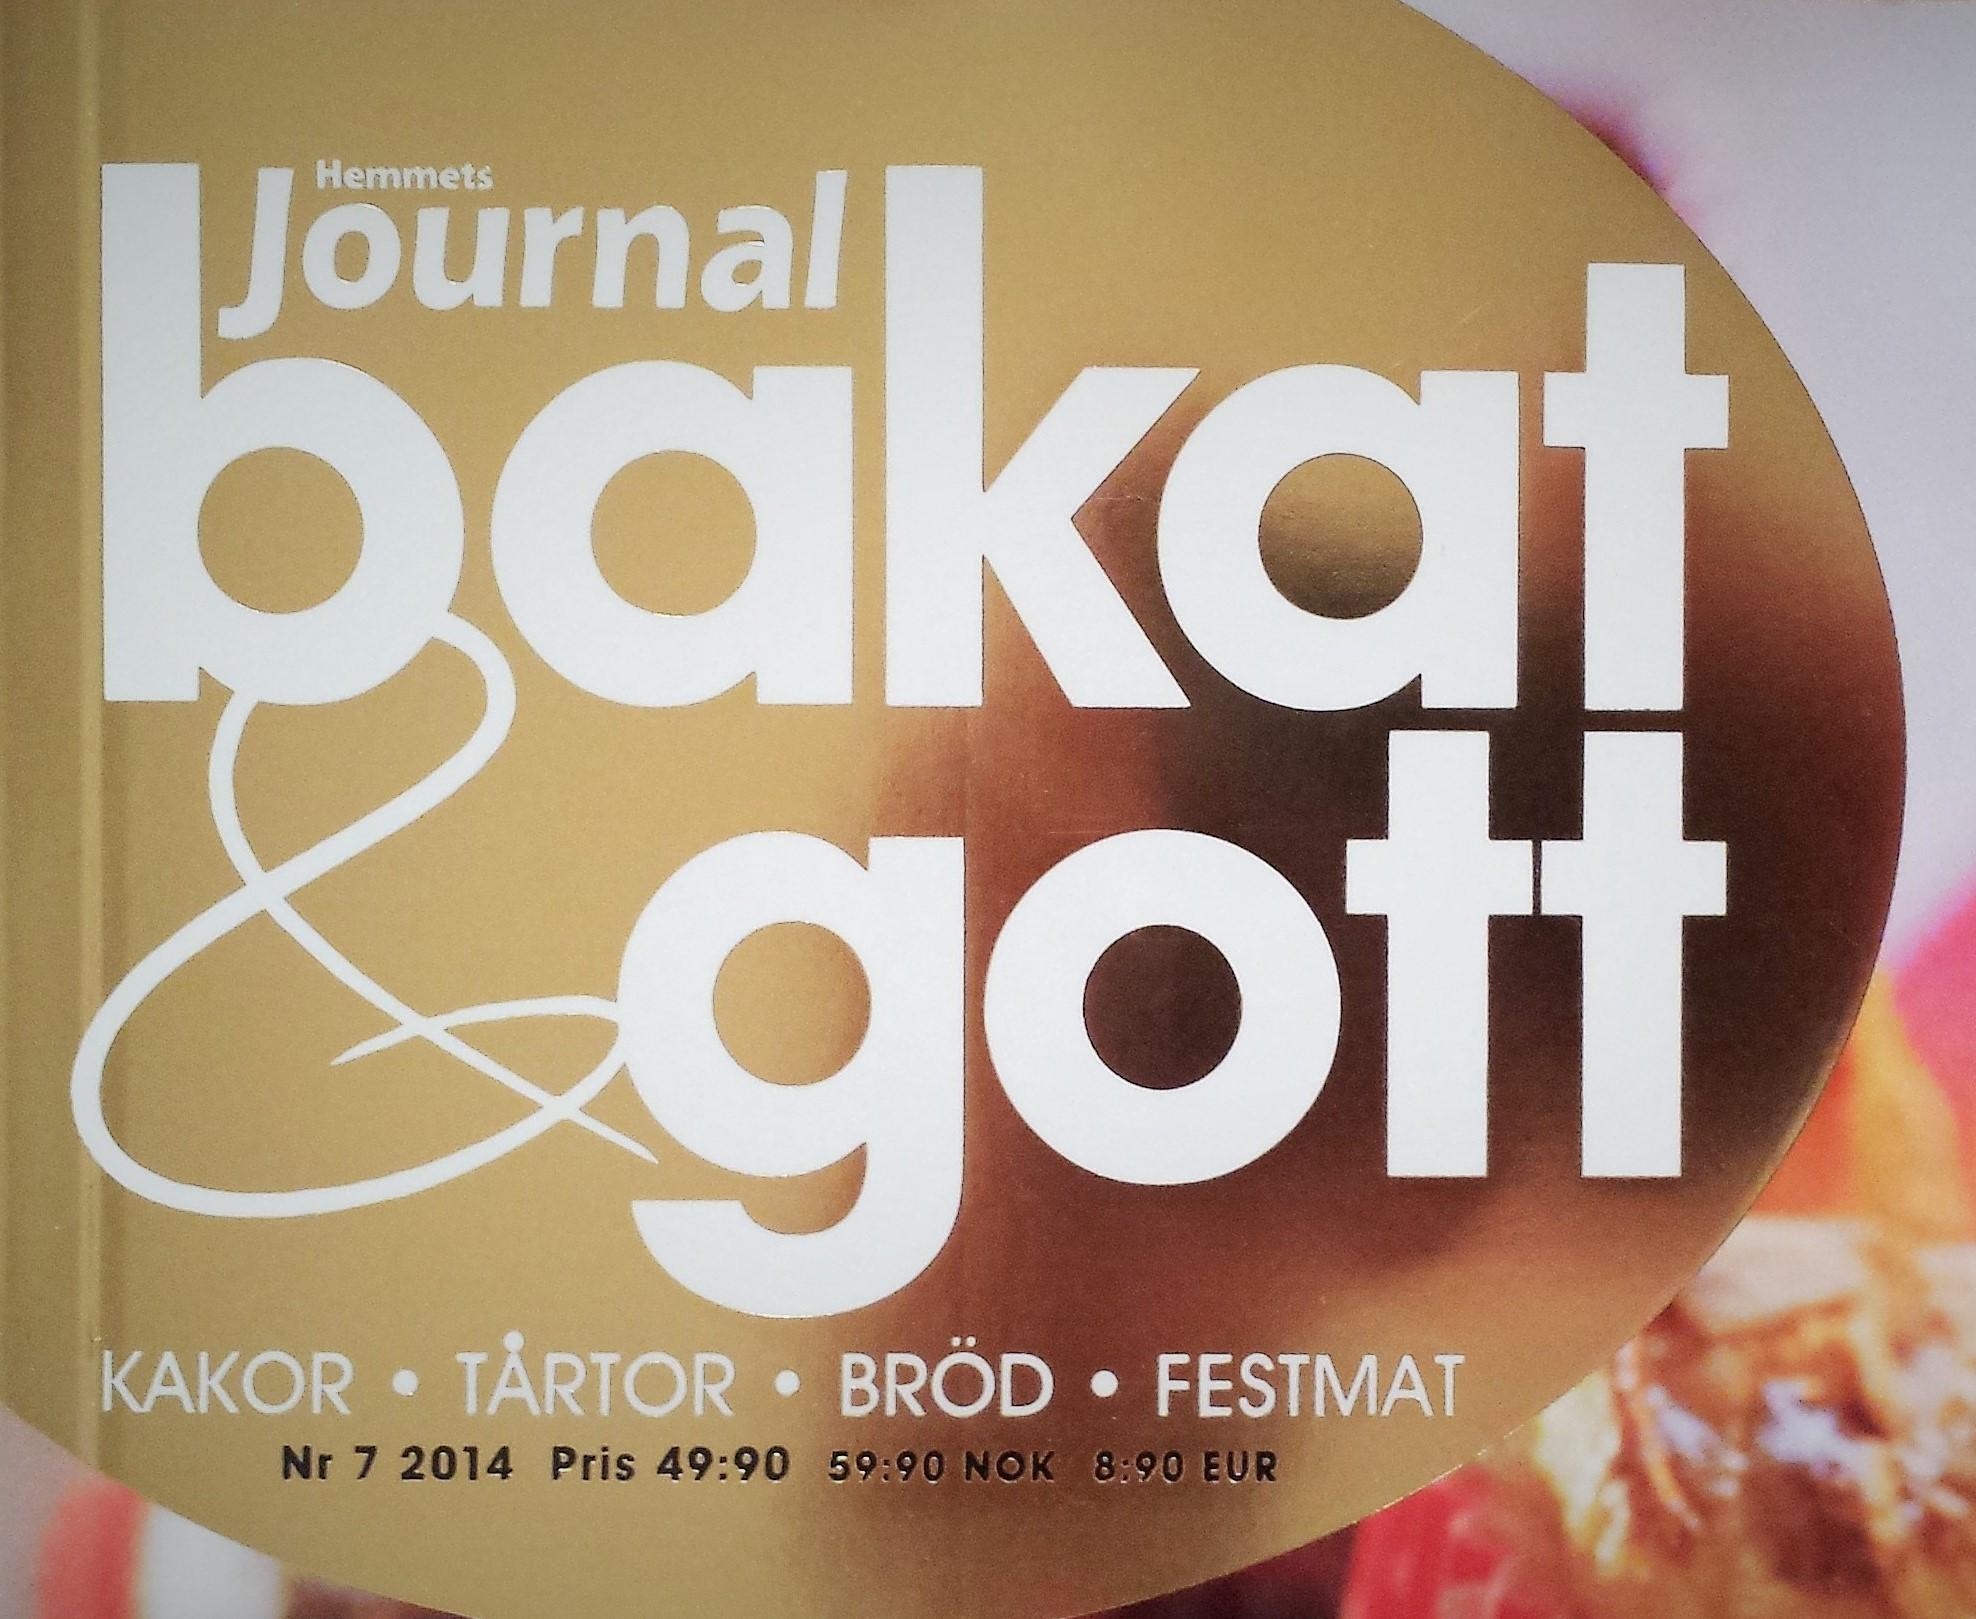 20141127 Bakat o Gott Omslaget